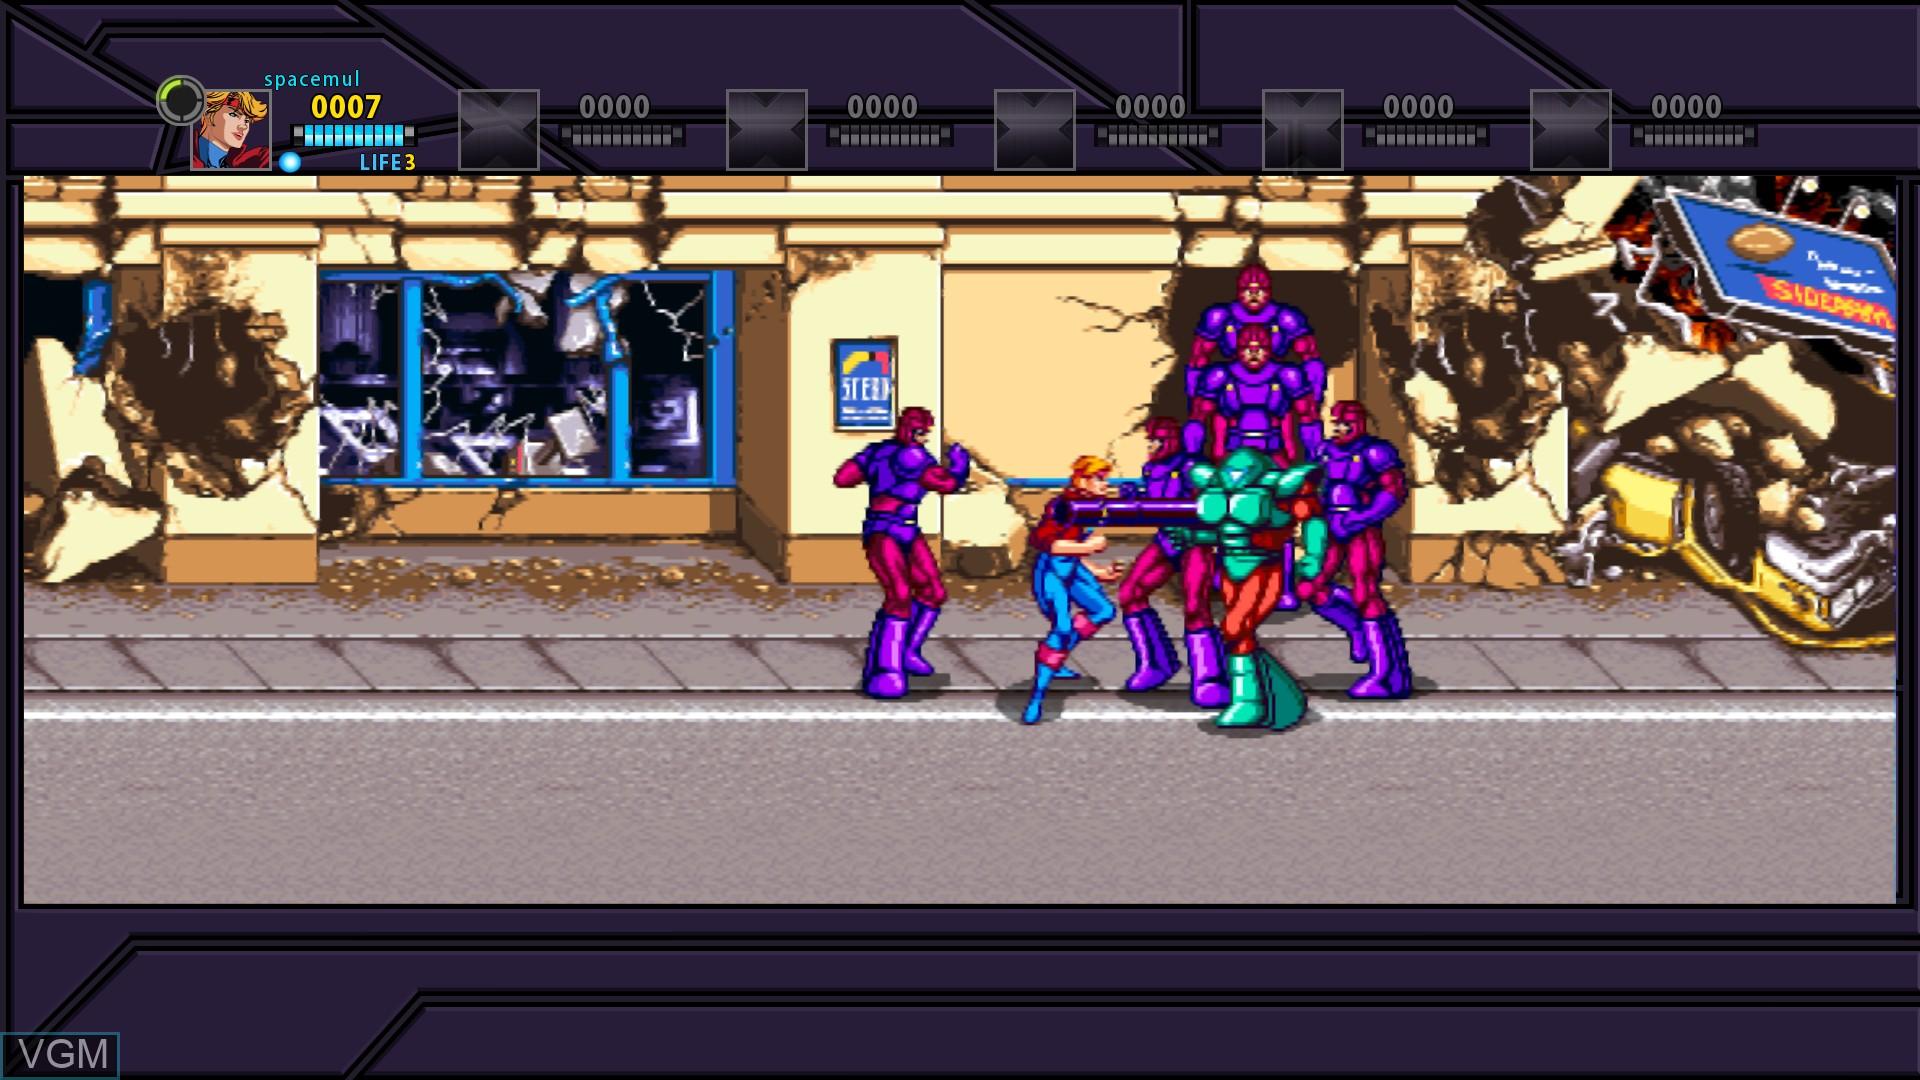 X-Men - The Arcade Game